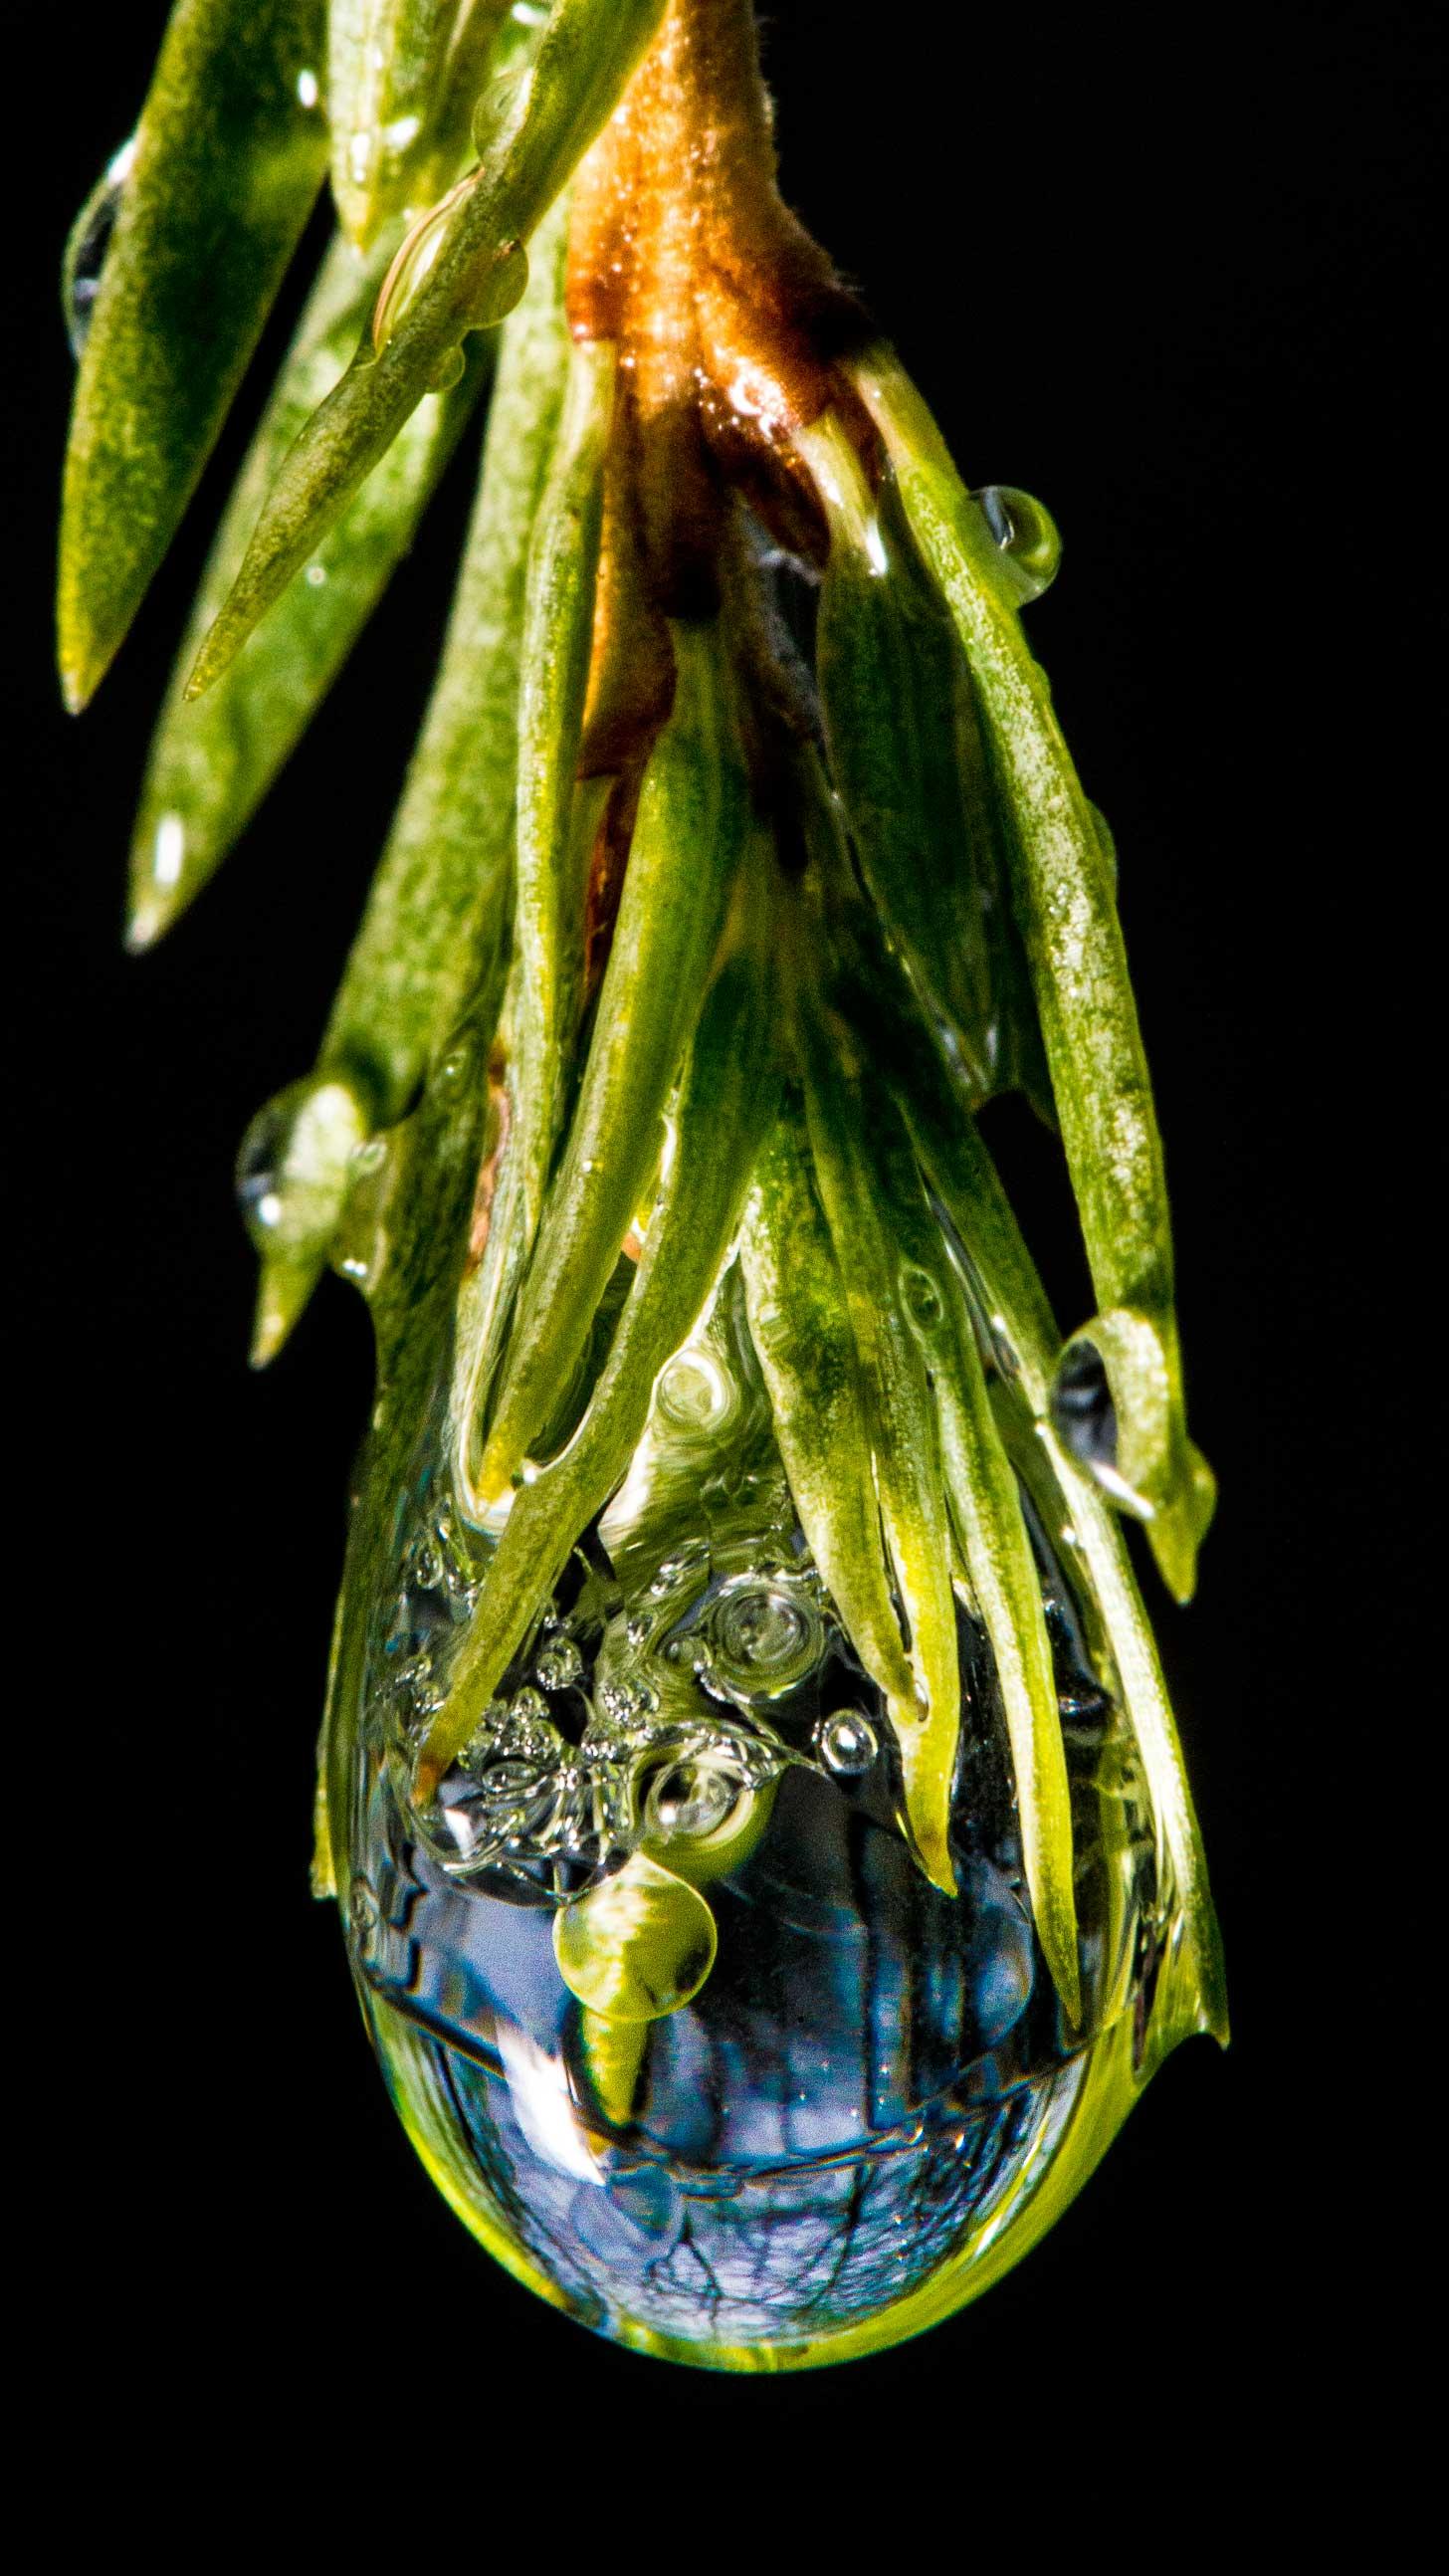 Frozen_Water_Droplet_Ice_ScenicTraverse.jpg